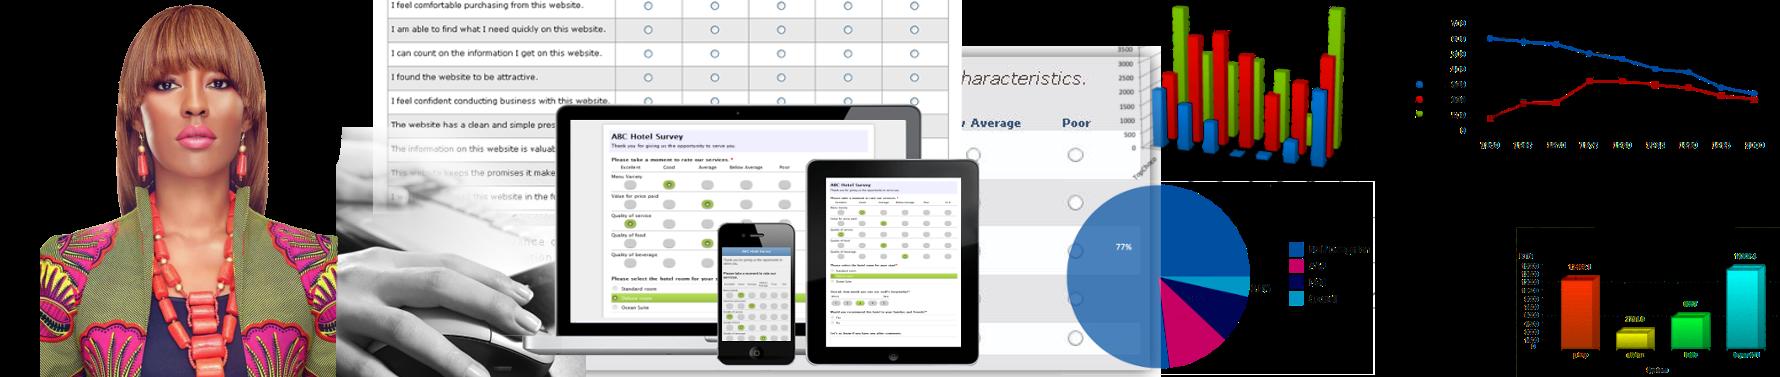 Focus Surveys Tools